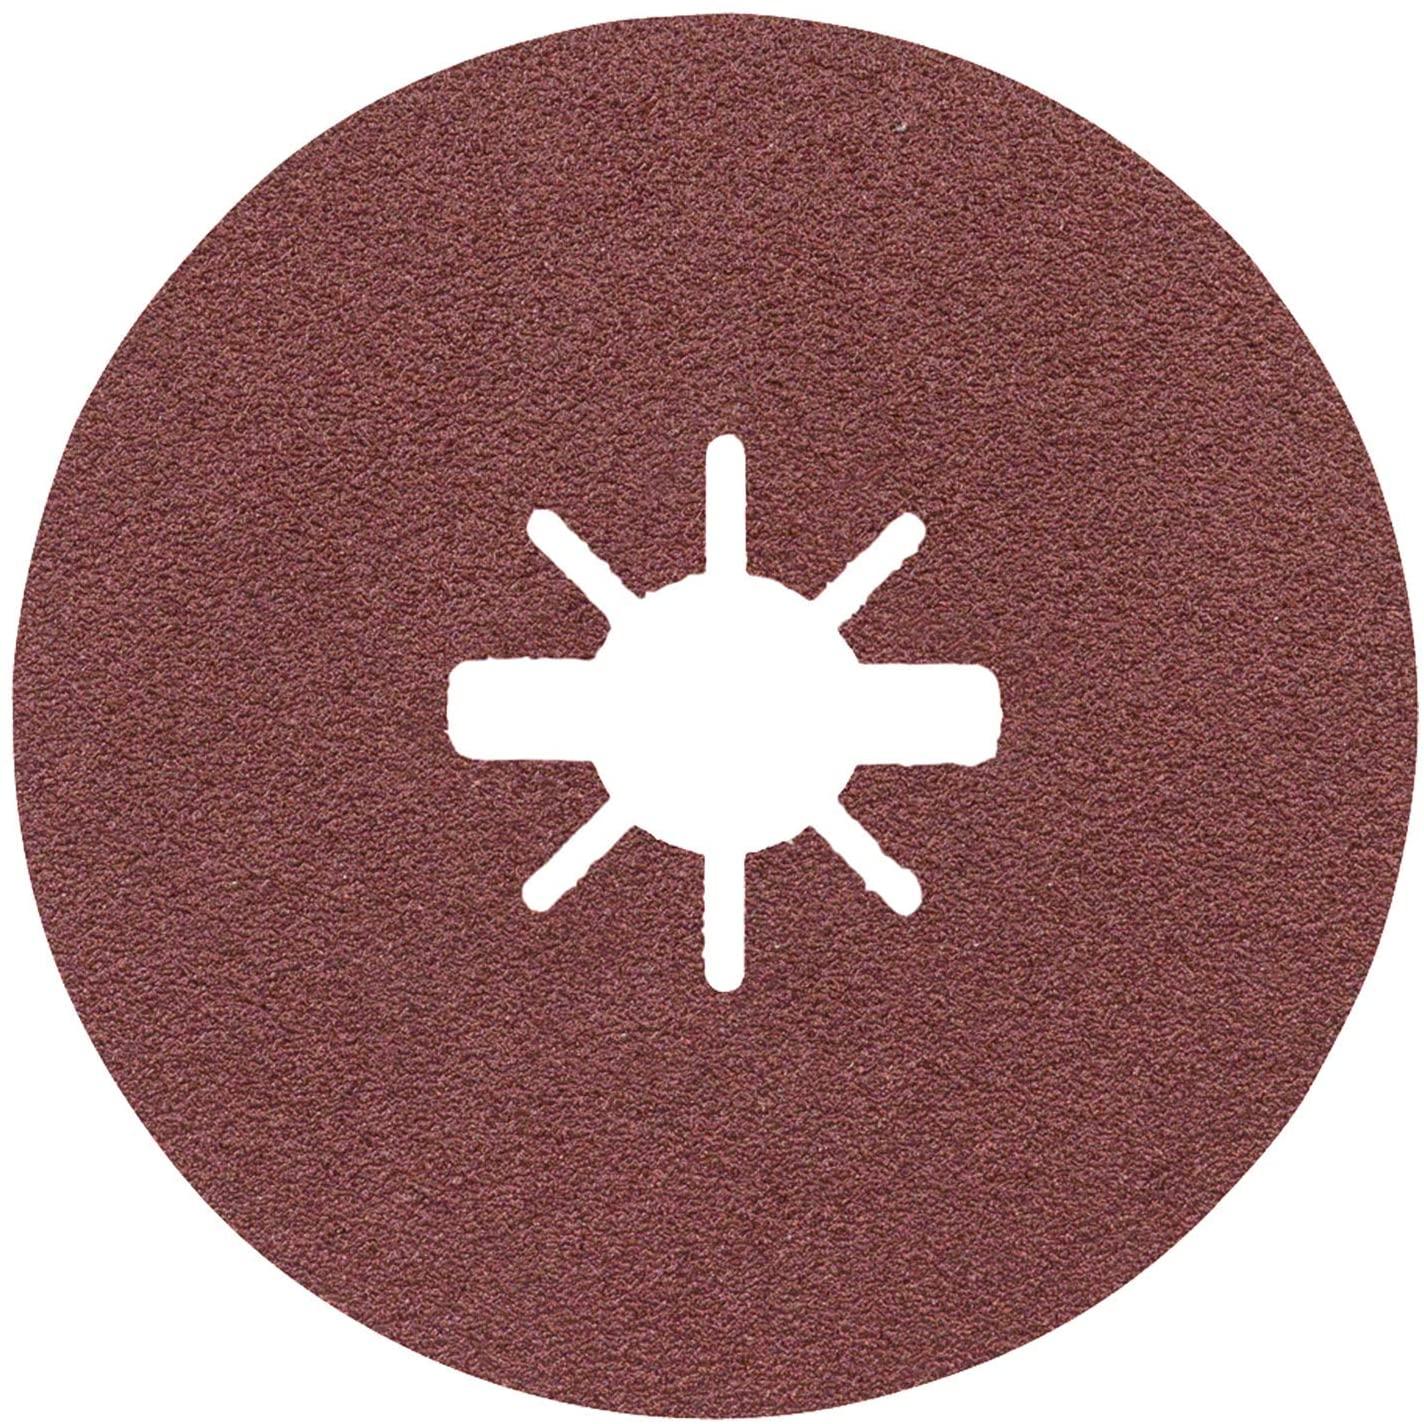 Bosch Professional Fibre Sanding Discs Expert (for Metal, X-LOCK, R444, Diameter 115 mm, Grit Size 60, Bore Diameter: 22.23 mm)